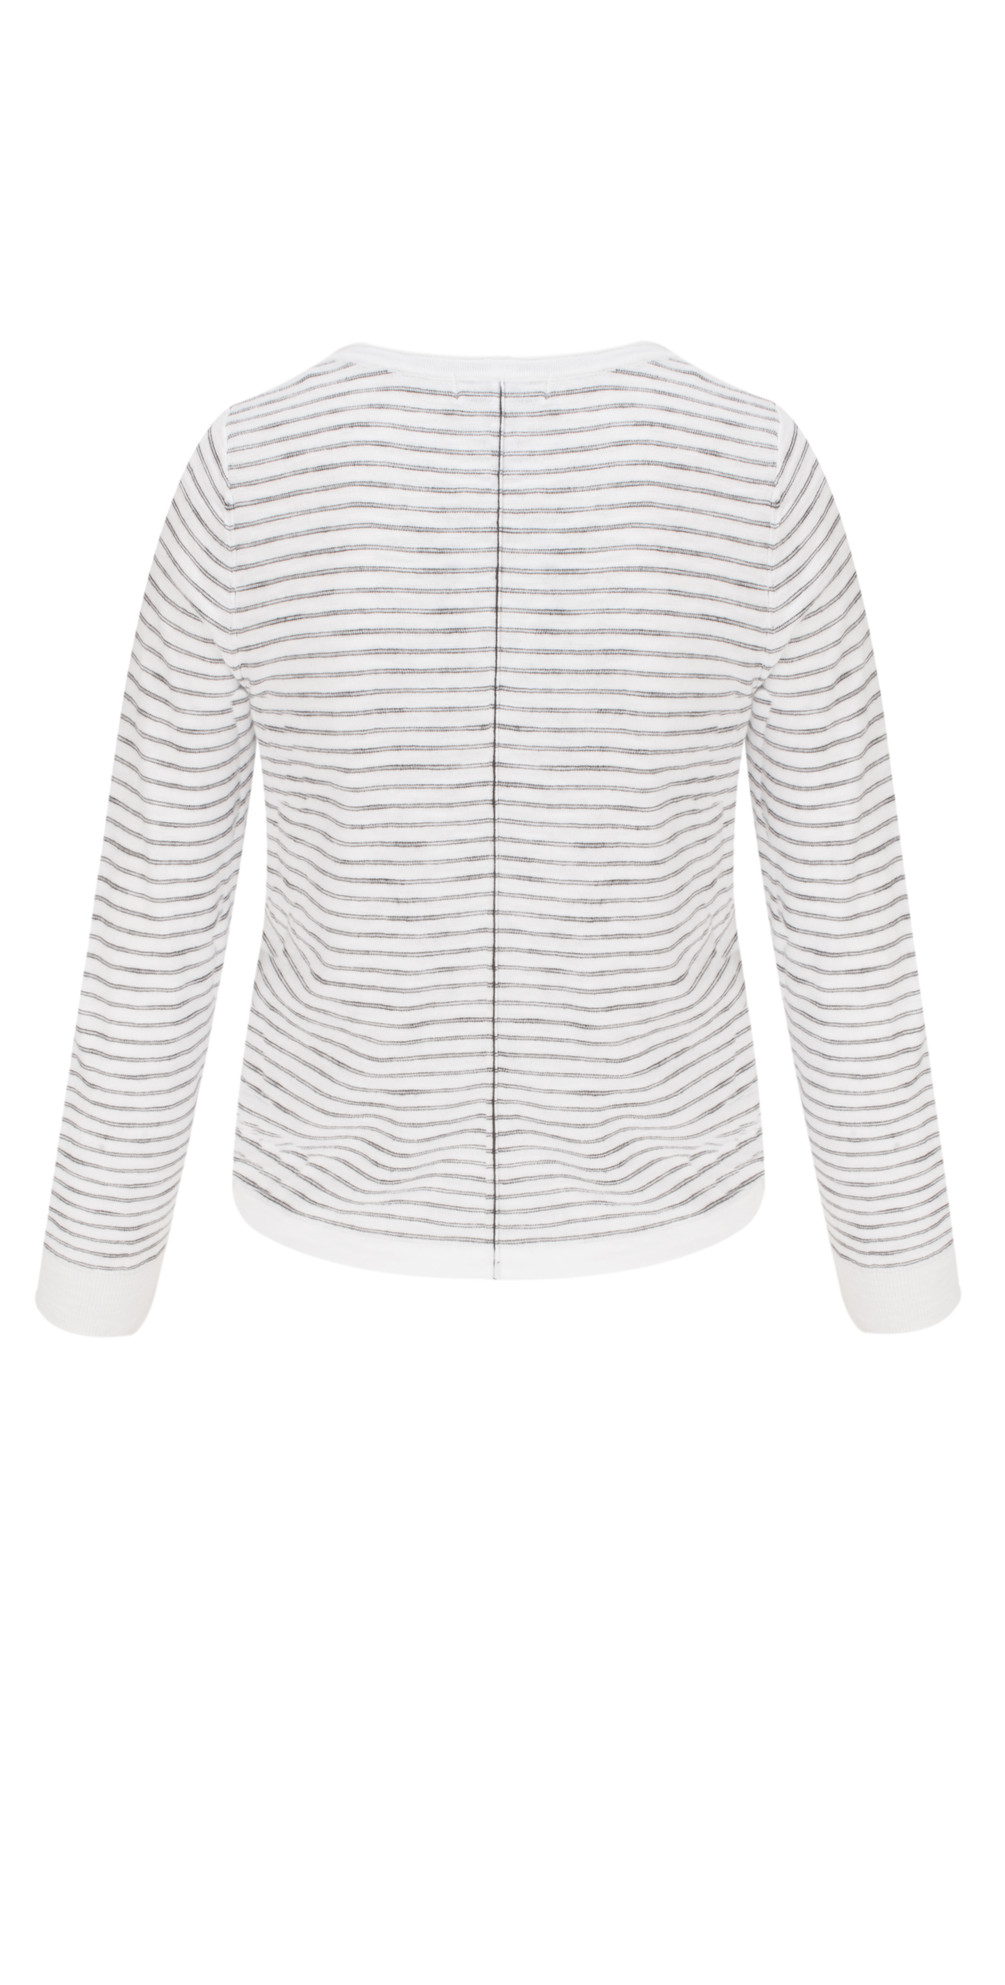 Striped Pattern Cardigan main image